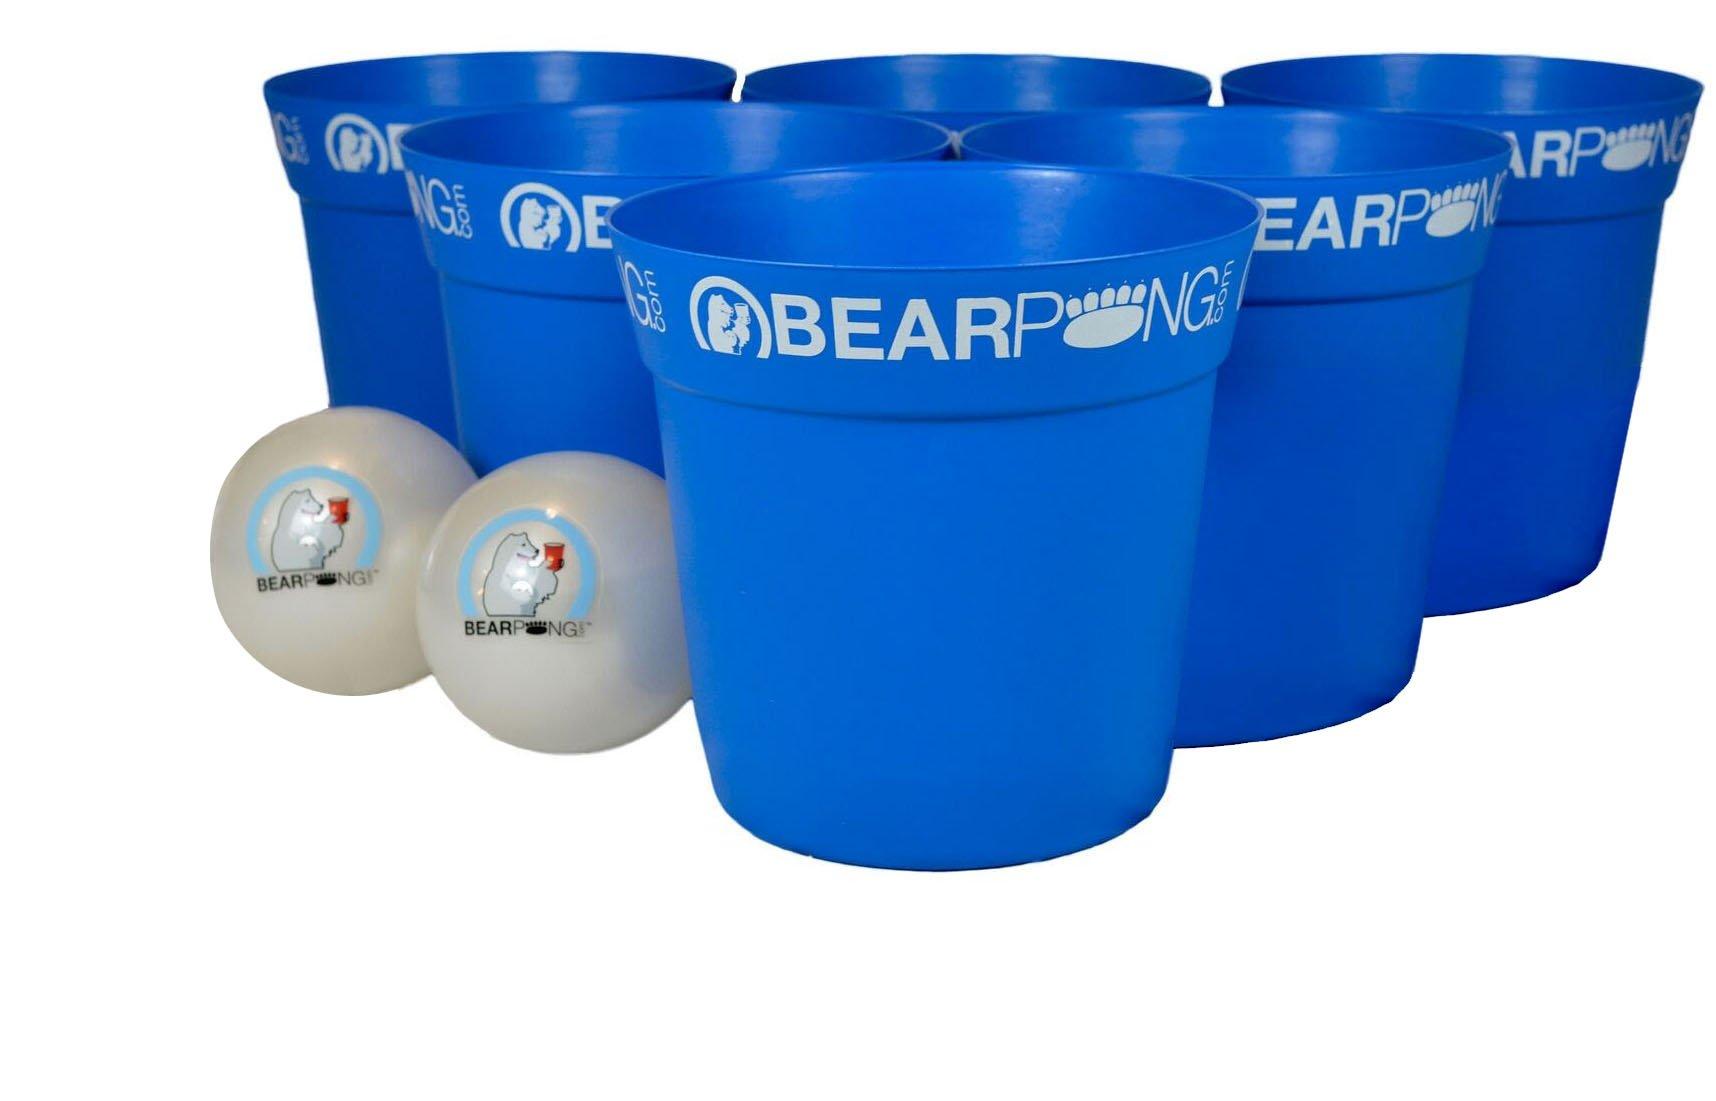 Bearpong Bearpong Game Set: 12 BEARPONG Buckets, 2 BEARPONG Balls with Carrying Case, and Instruction (Blue) by Bear Pong